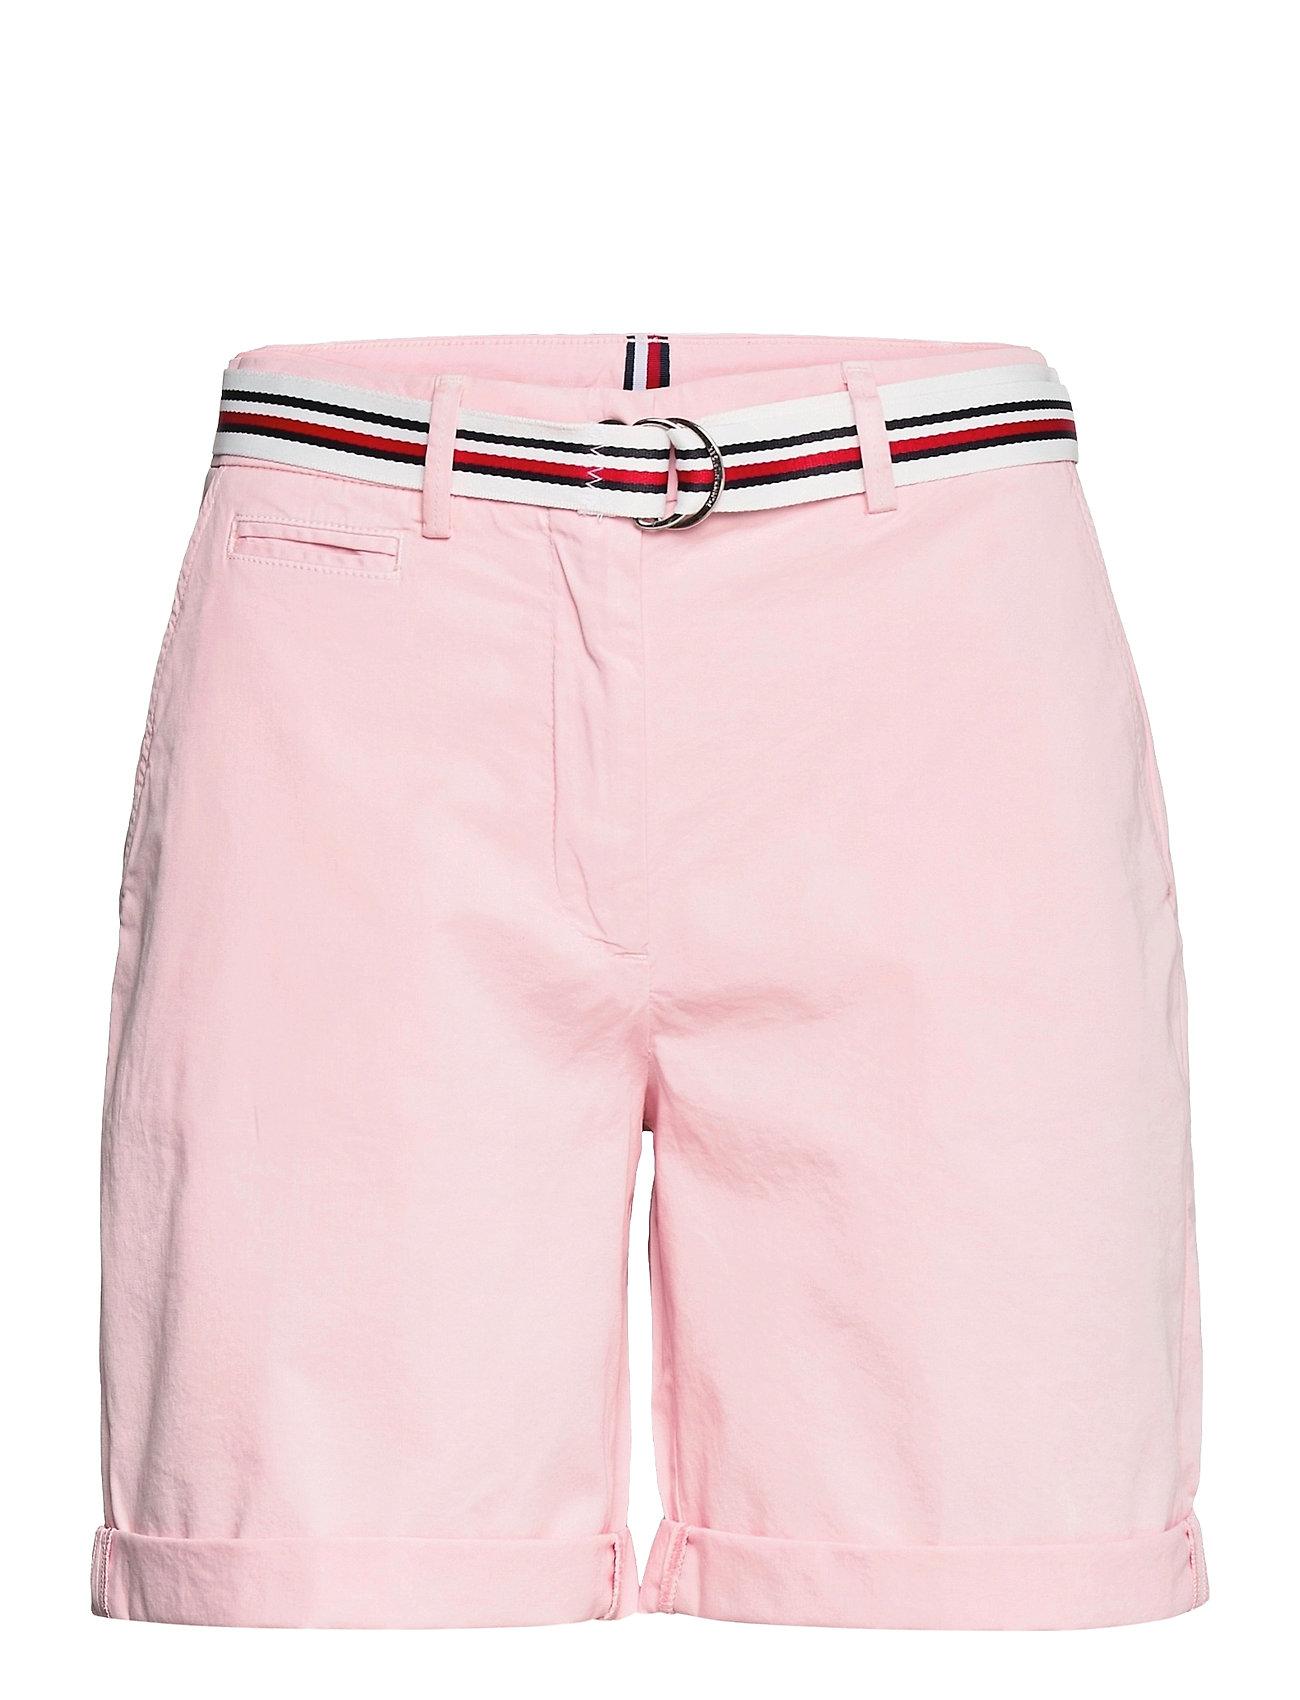 Image of Cotton Tencel Chino Rw Short Shorts Chino Shorts Lyserød Tommy Hilfiger (3507356587)